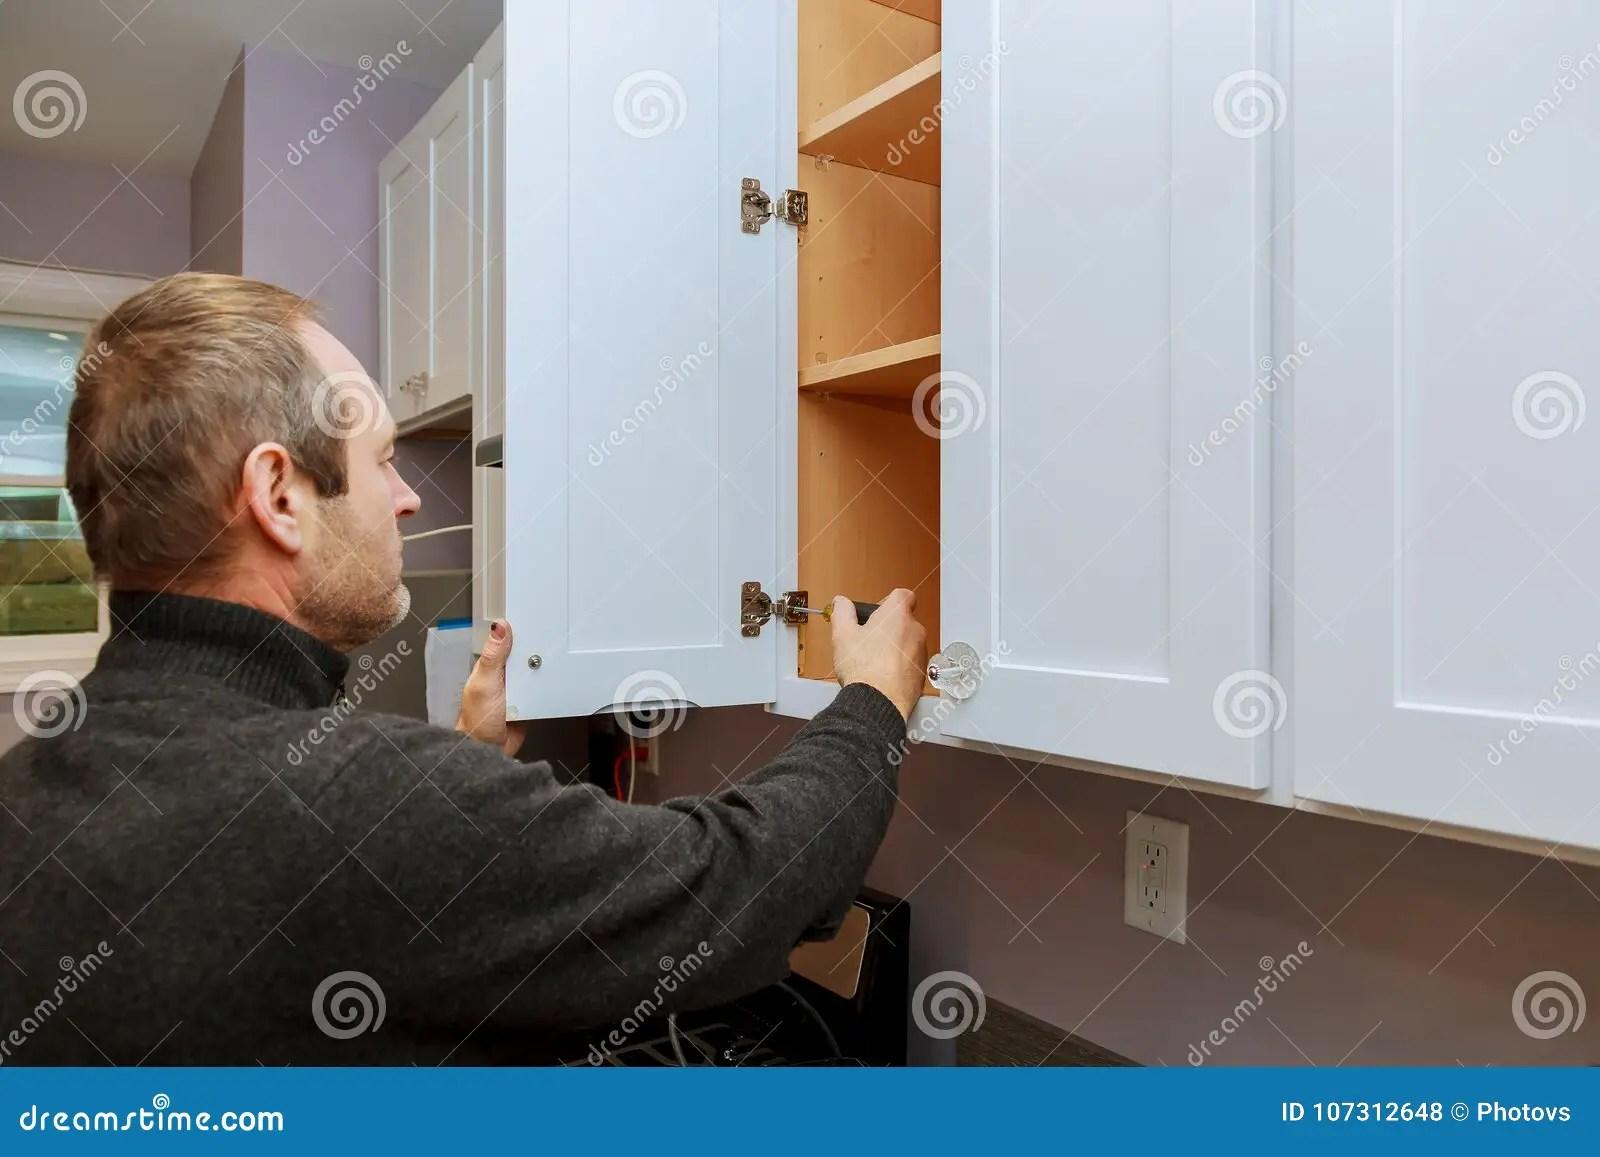 kitchen cabinets set amy's soup 工作者设置在白色内阁的新的把柄有安装厨柜的螺丝刀的库存照片 图片包括 工作者设置在白色内阁的新的把柄有安装厨柜的螺丝刀